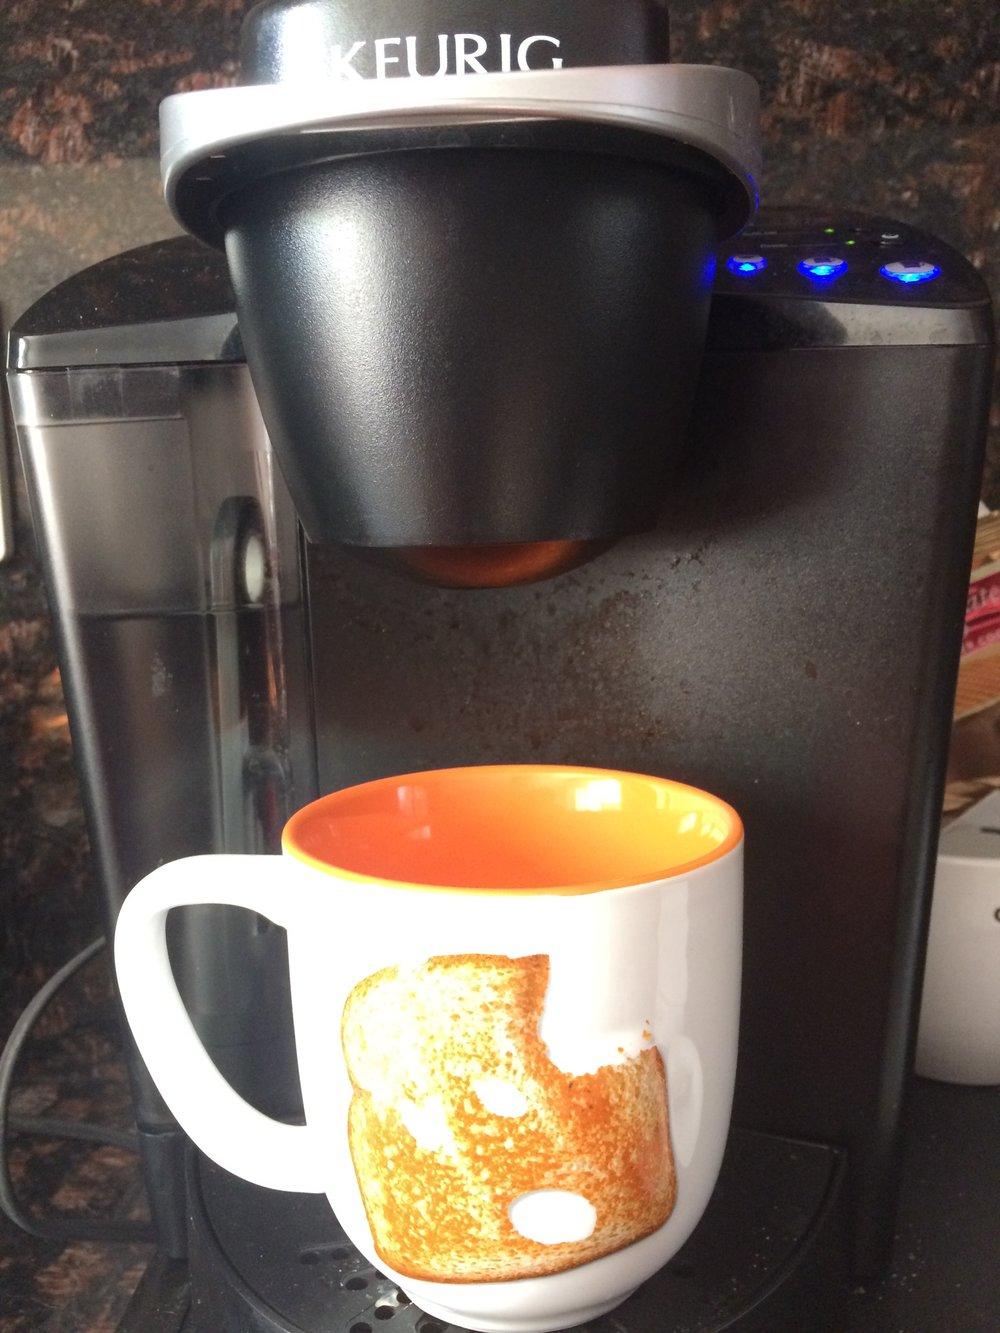 Good Toast, fill 'er up!